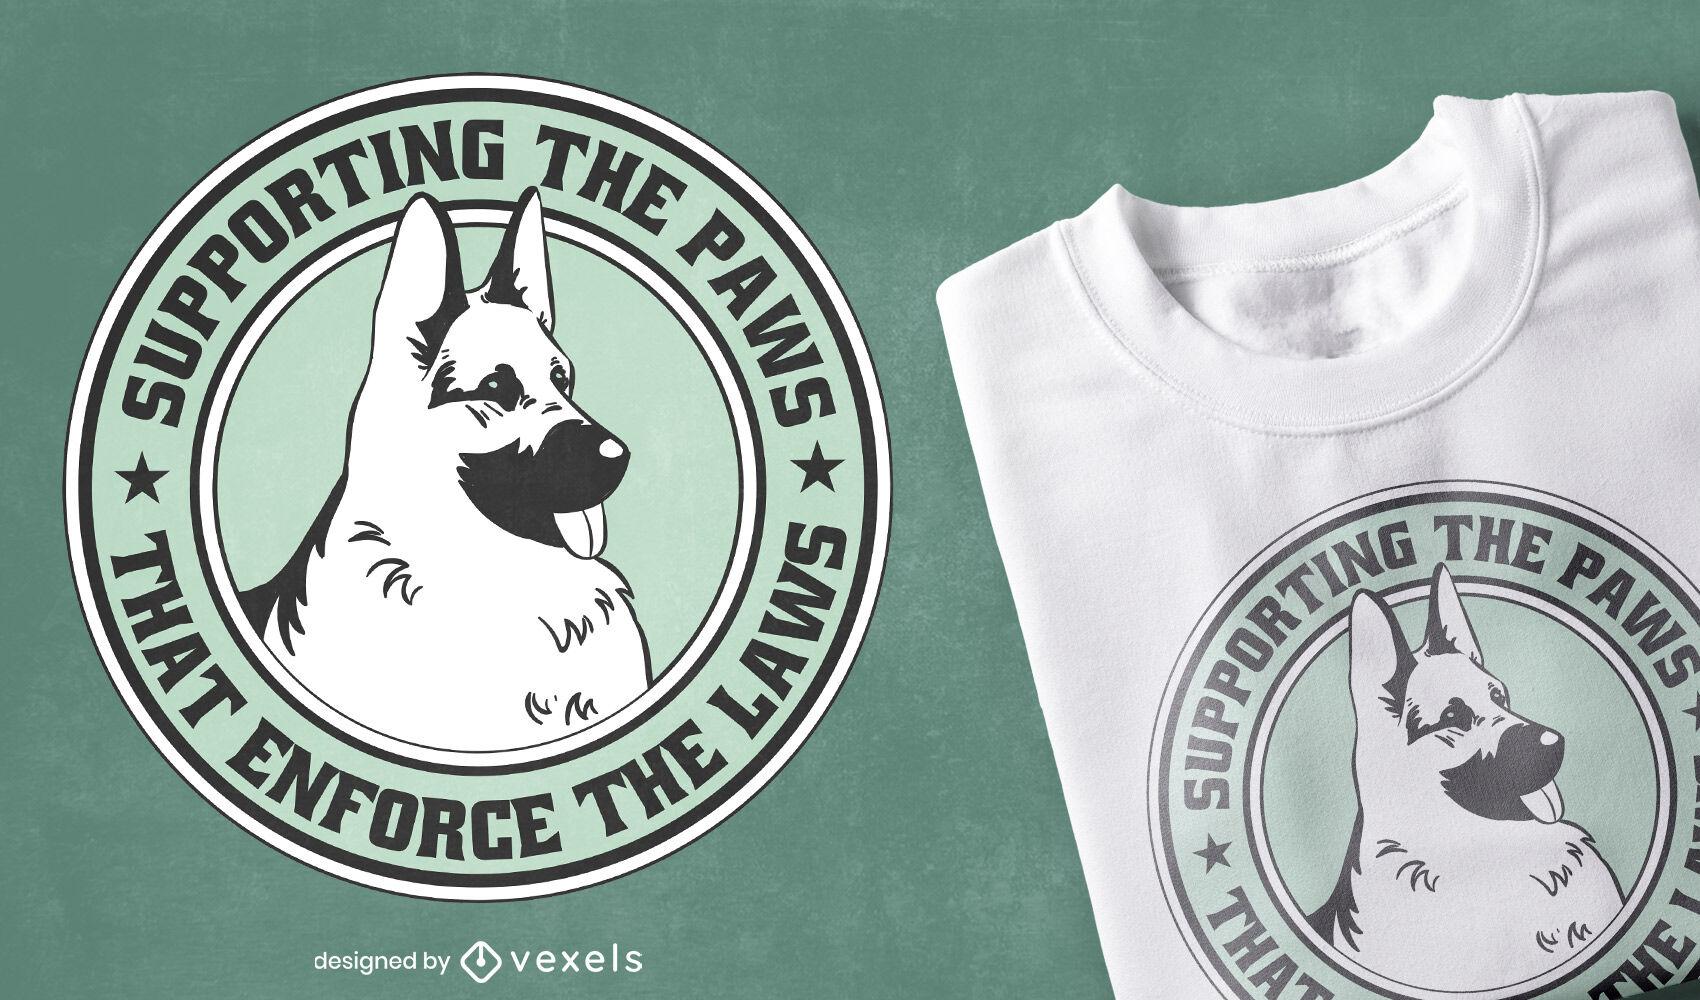 German shepherd law enforcement t-shirt design